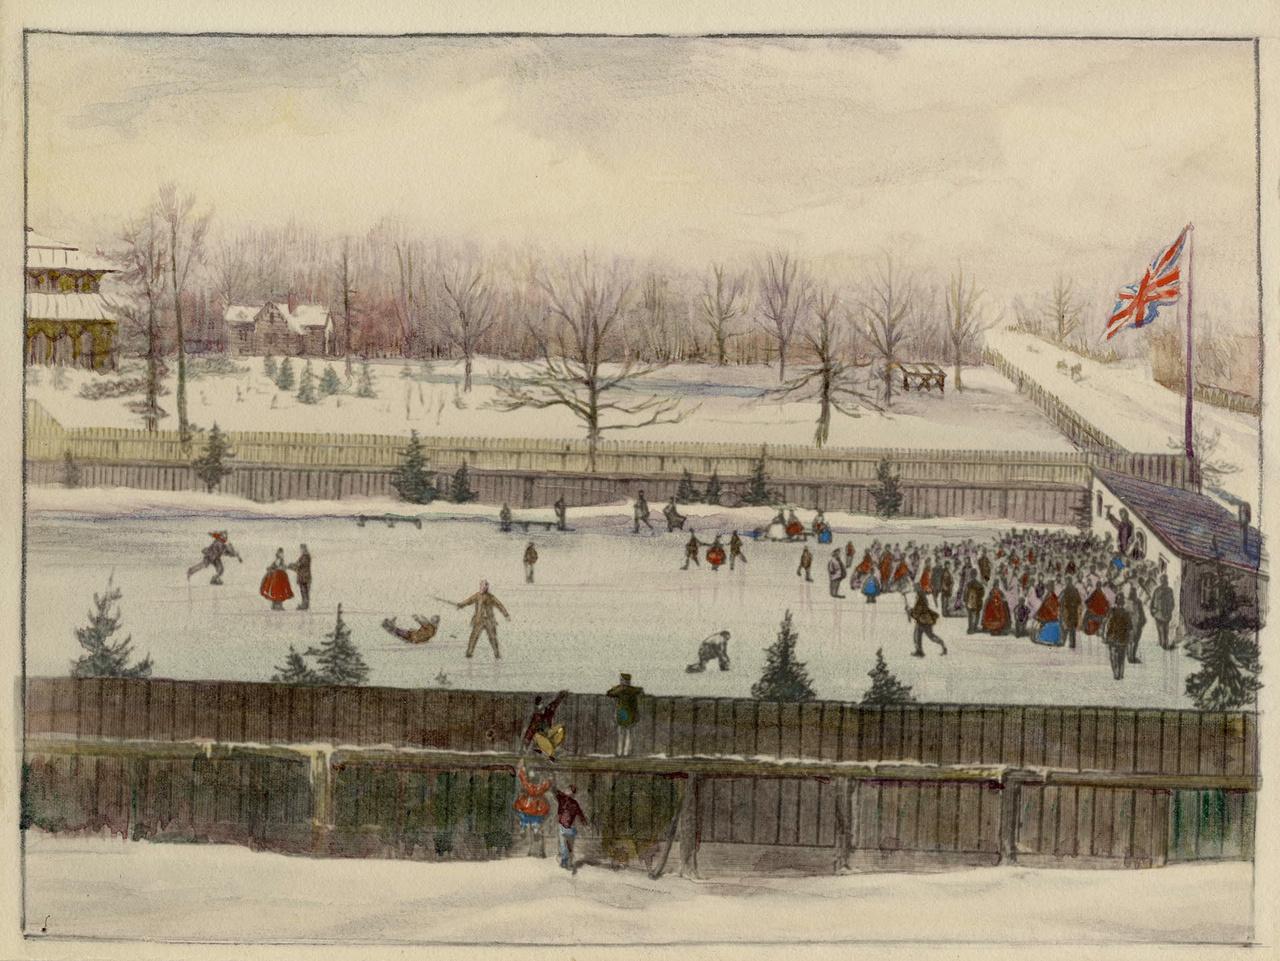 Victoria Skating Rink, Gerrard St. E., s.w. cor. Sherbourne St.; looking n., Allan Gardens immediately behind rink.